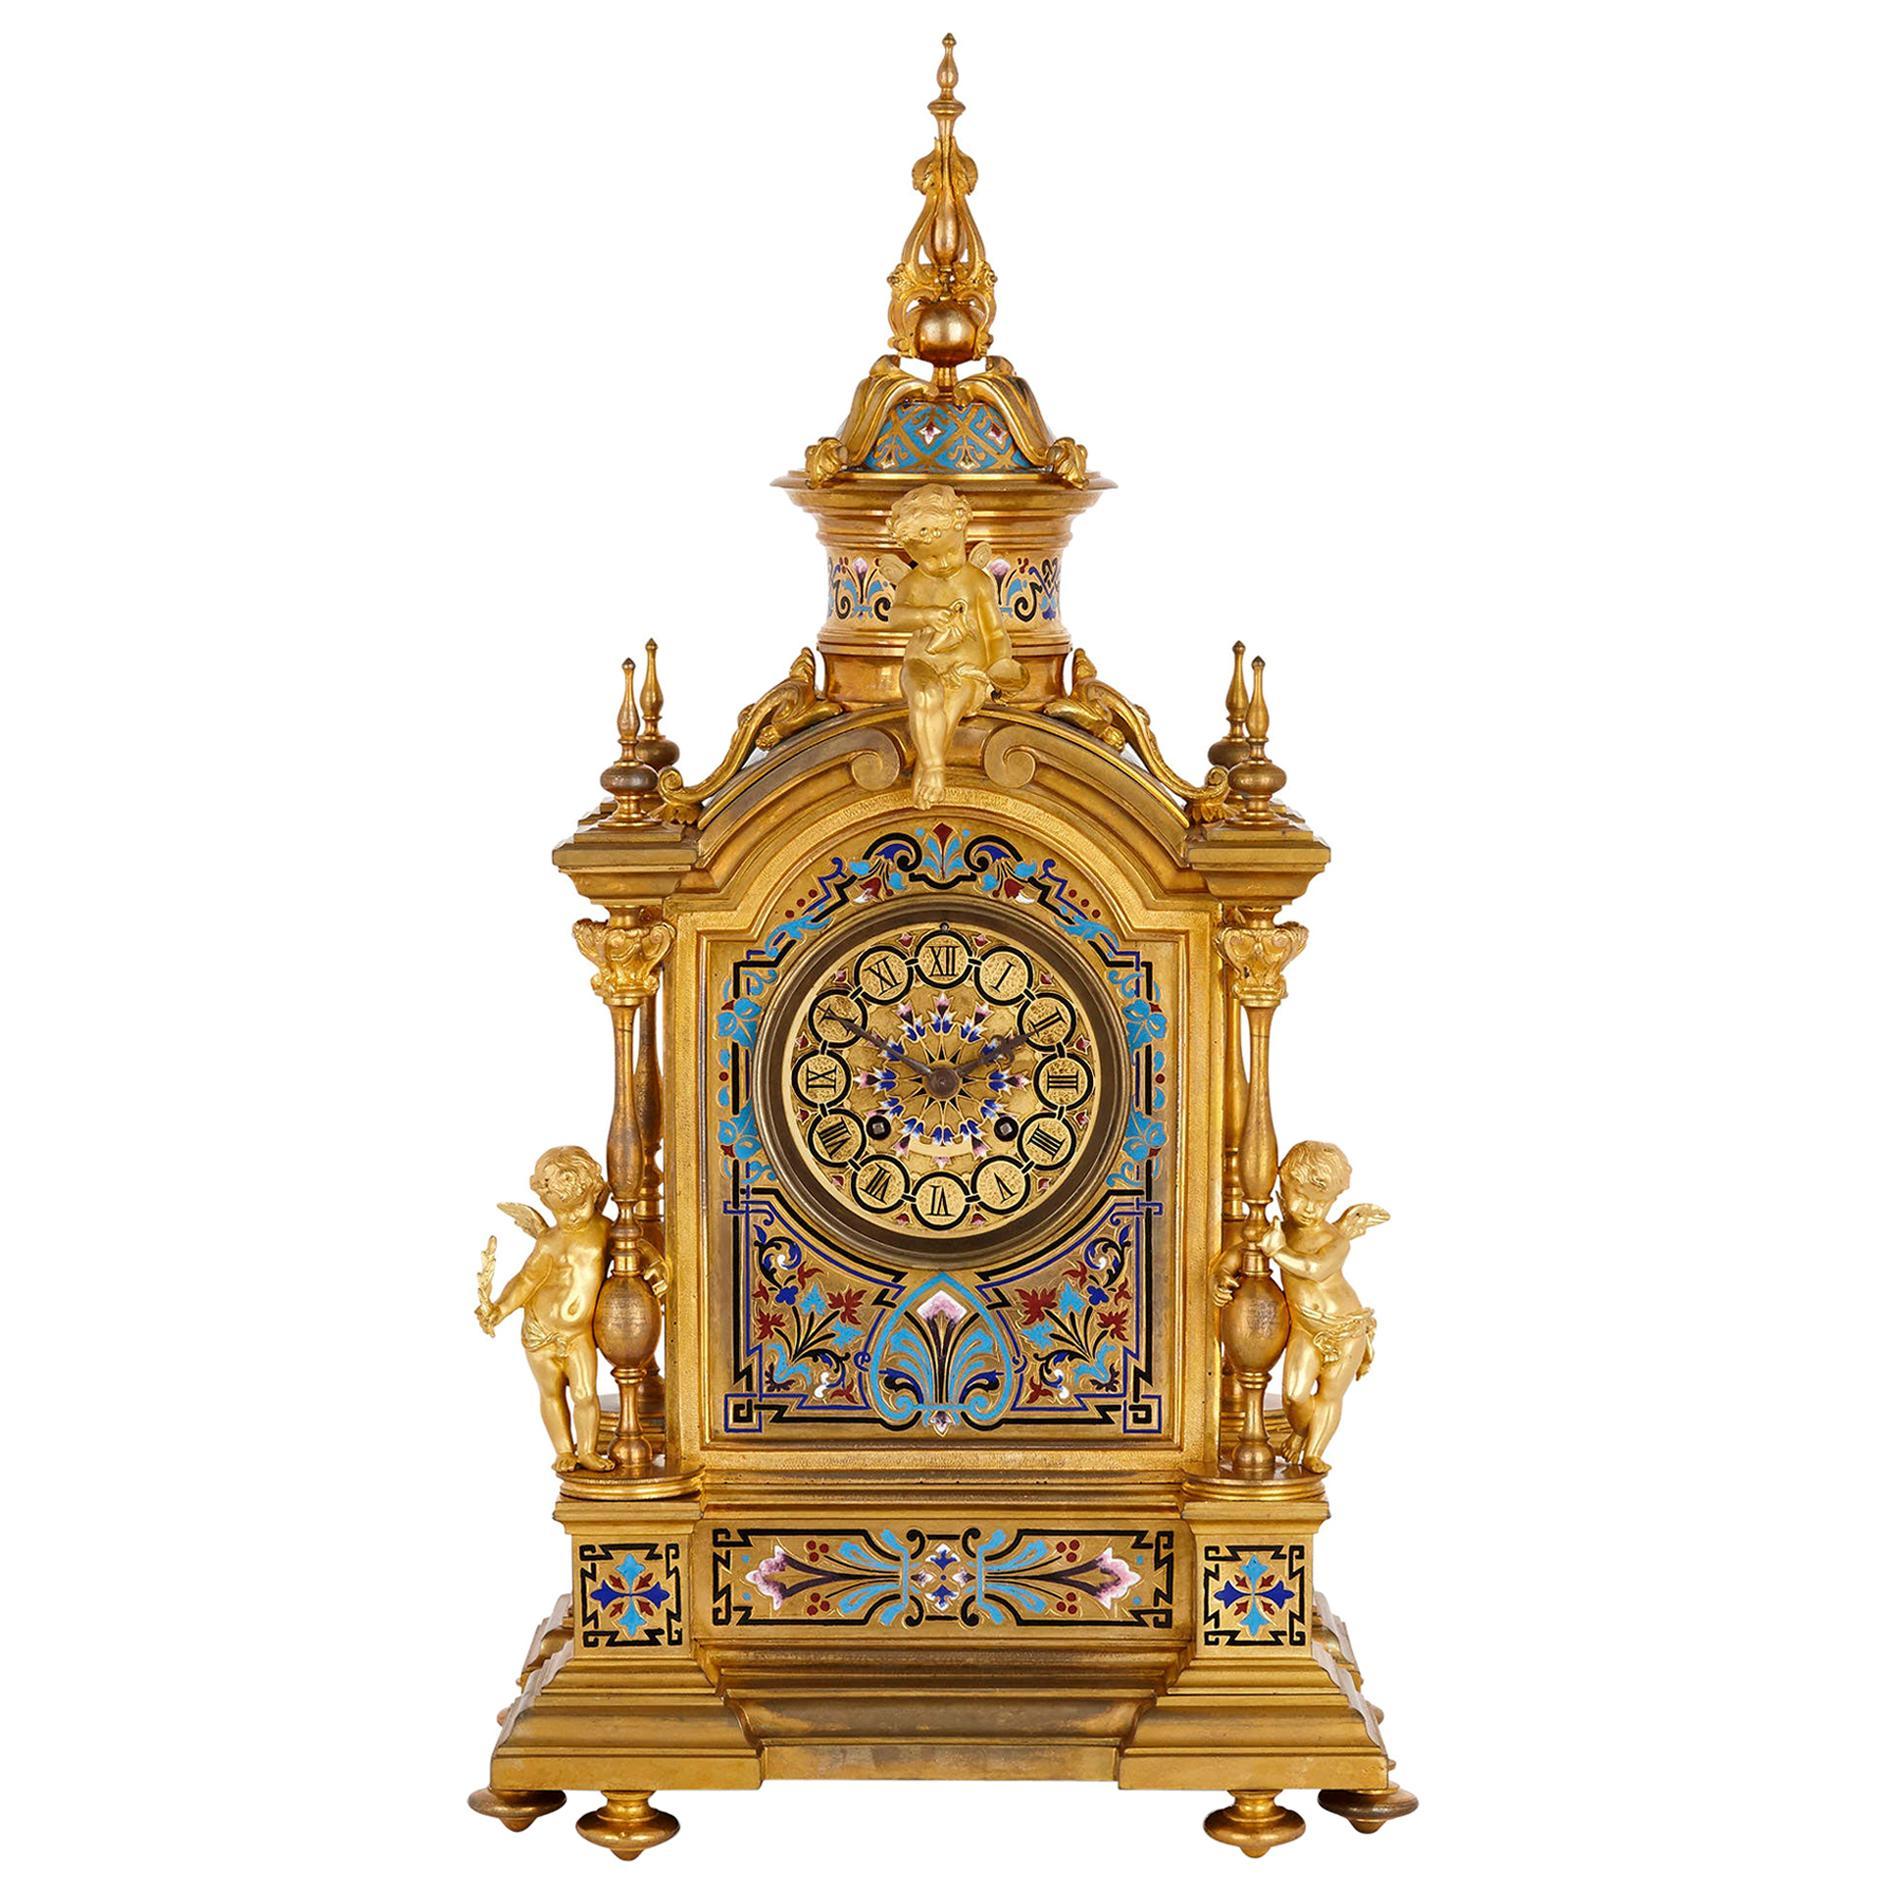 Renaissance Revival Enamel and Gilt Bronze Mantel Clock